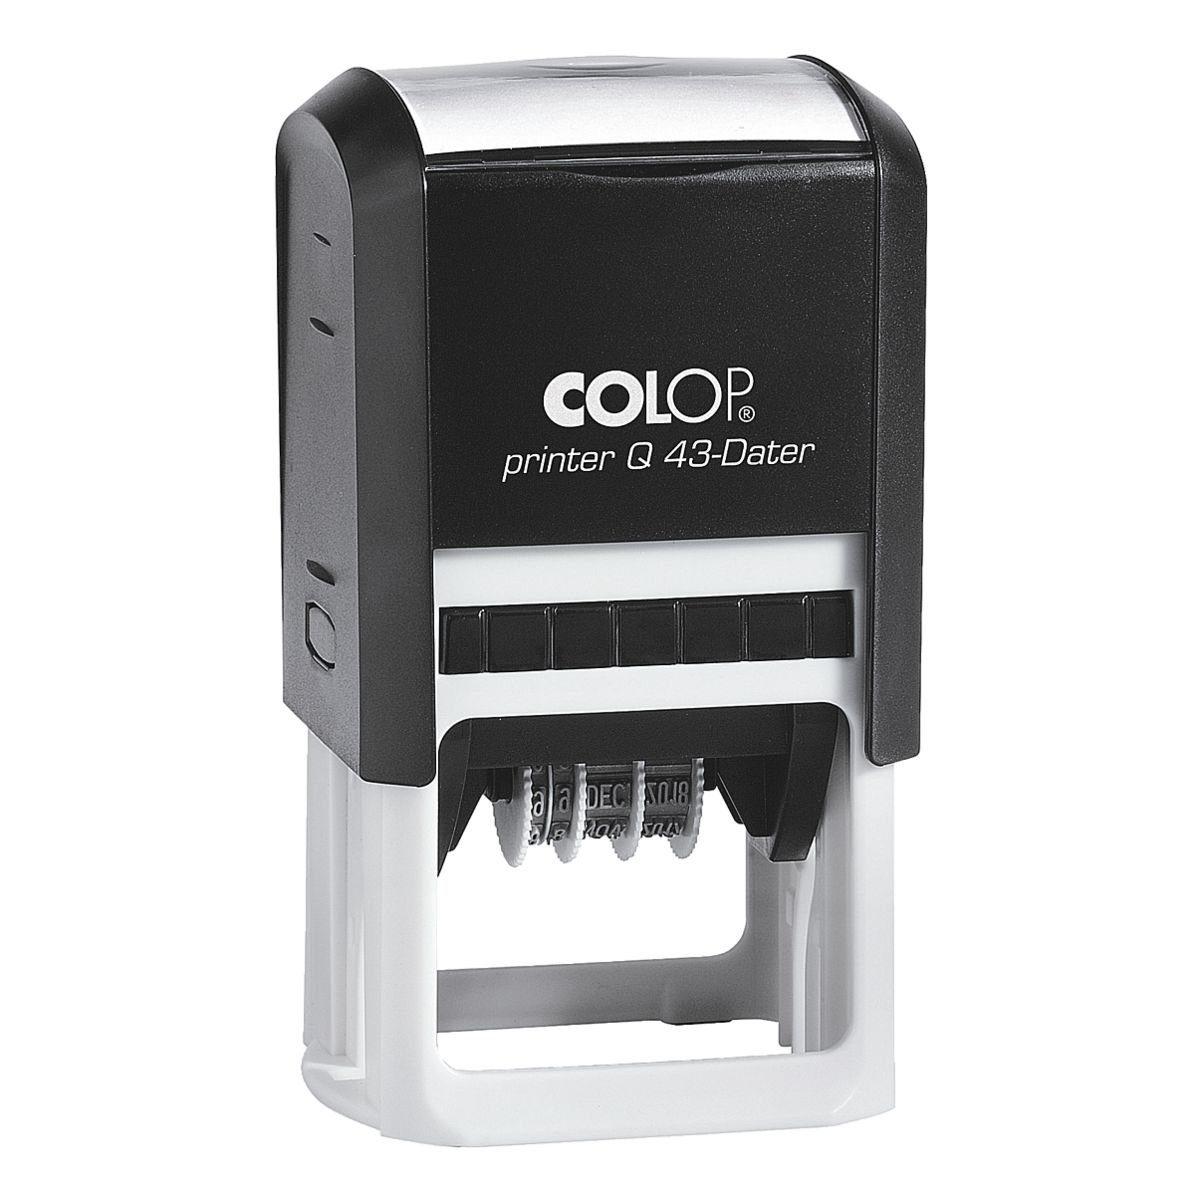 COLOP Selbstfärbender Datumsstempel »Printer Q43 Dater«